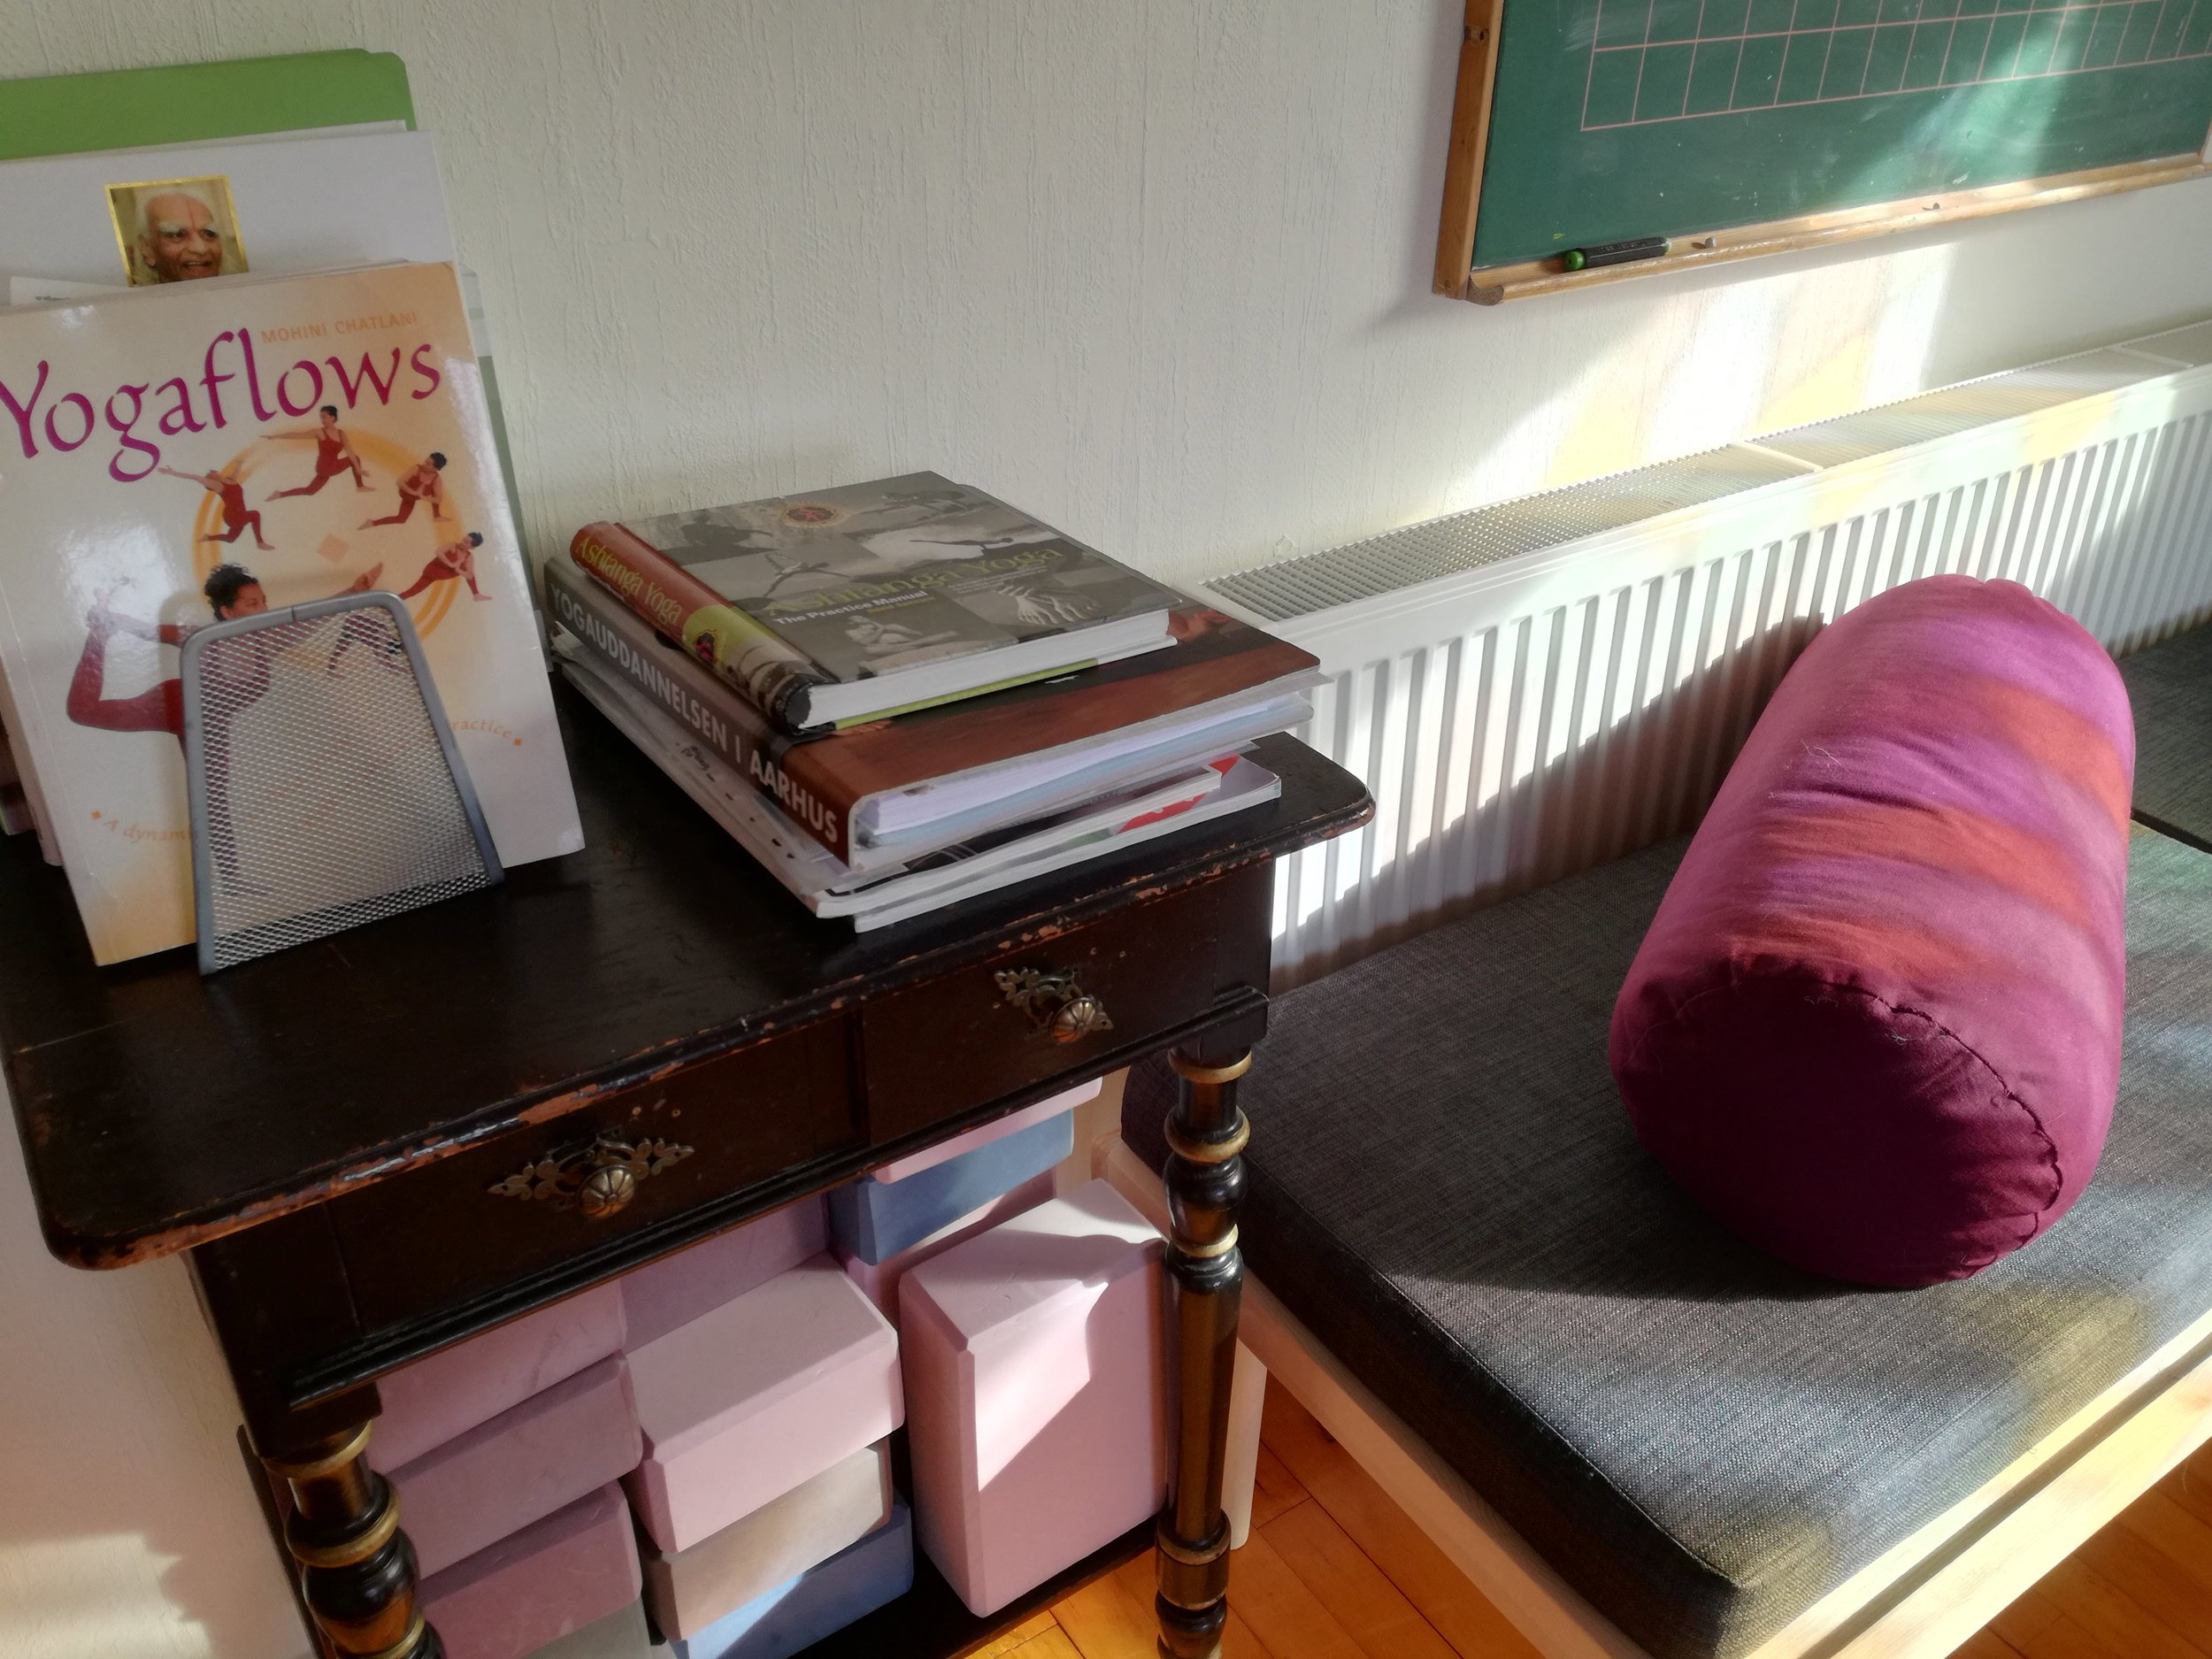 bøger på sybord.jpg